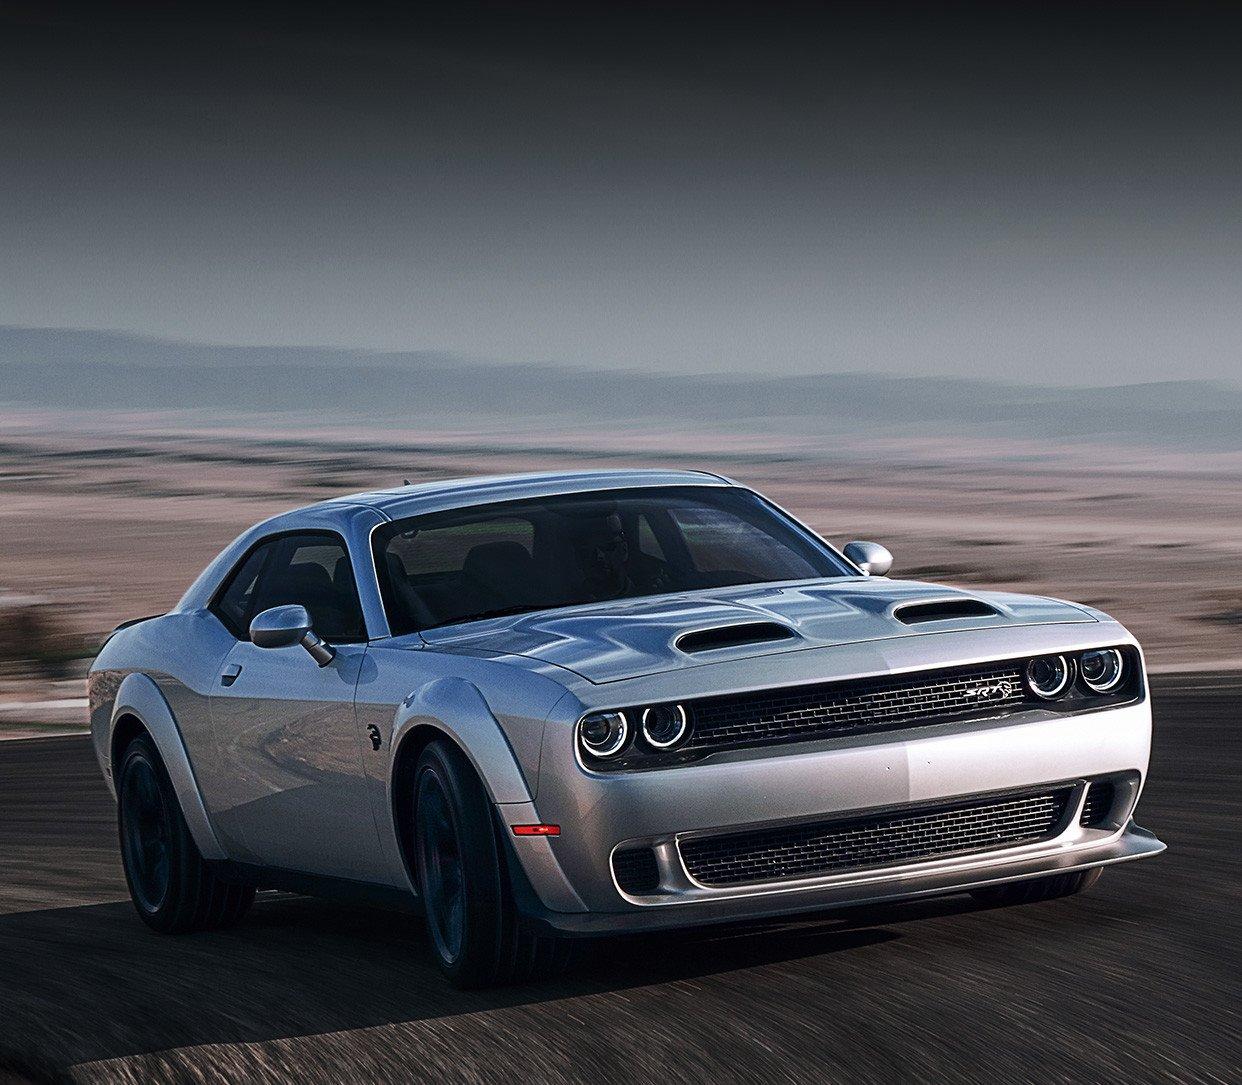 2020 Dodge Challenger Review Hunt Chrysler Fiat